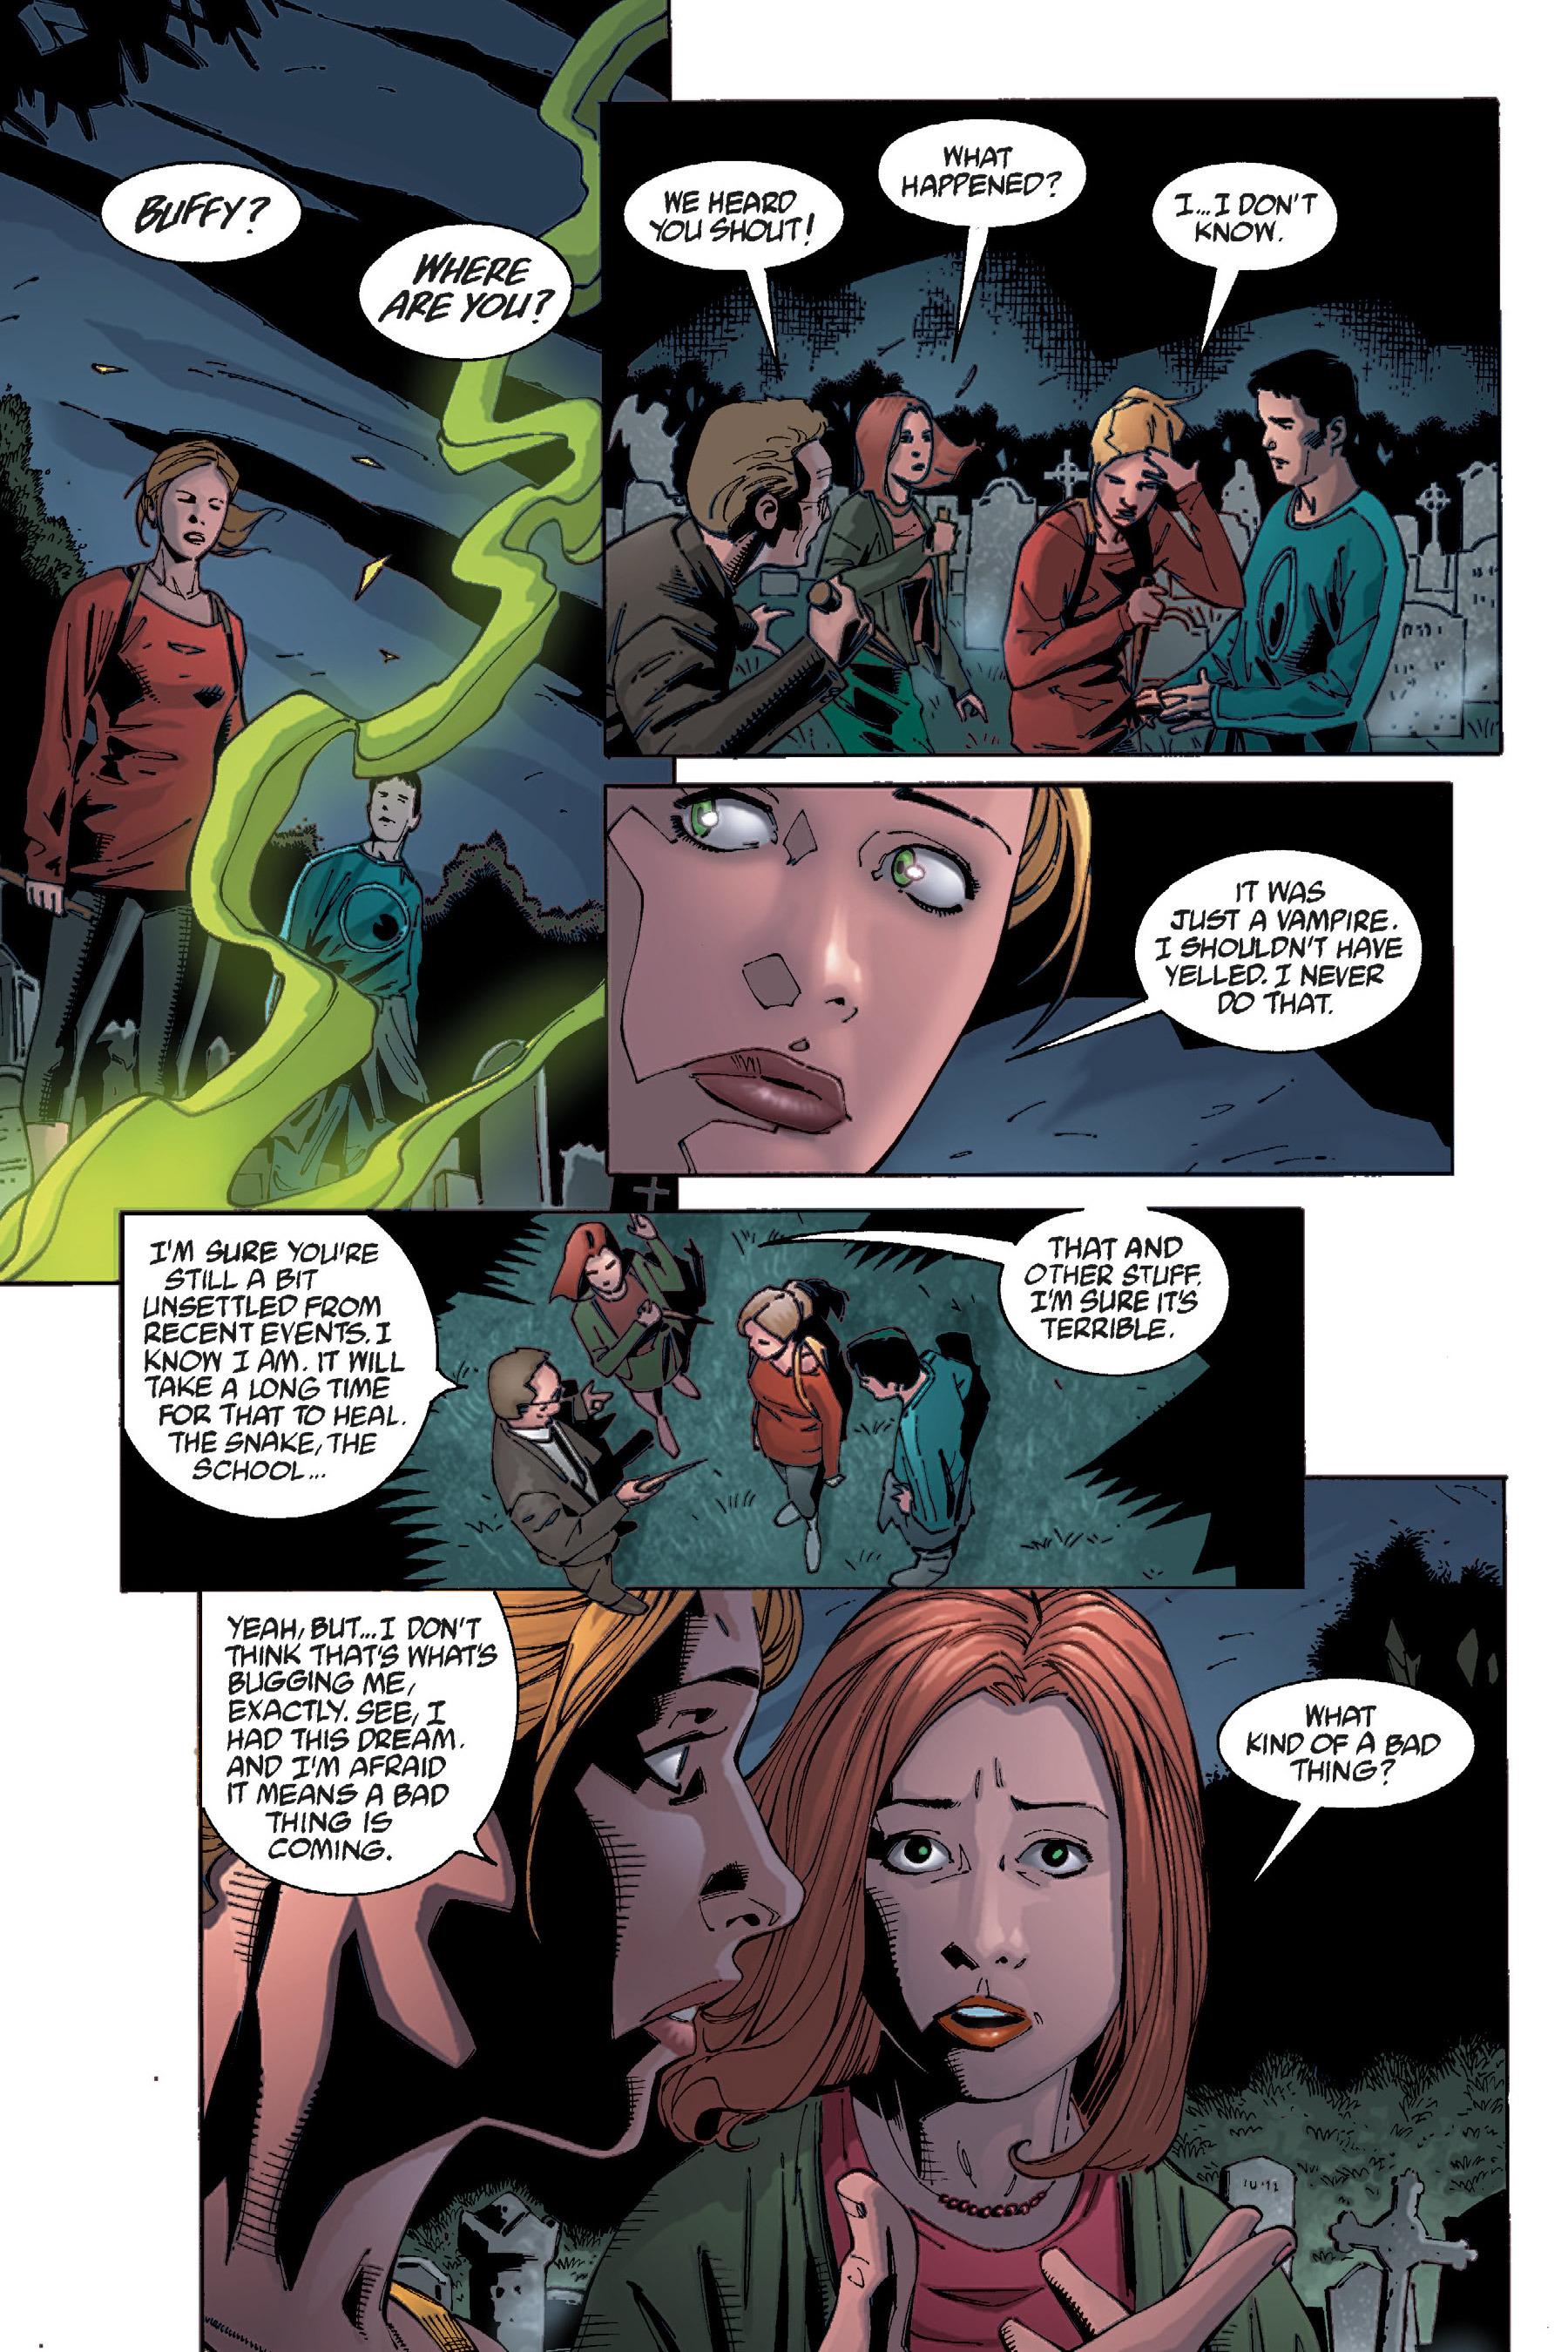 Read online Buffy the Vampire Slayer: Omnibus comic -  Issue # TPB 5 - 22